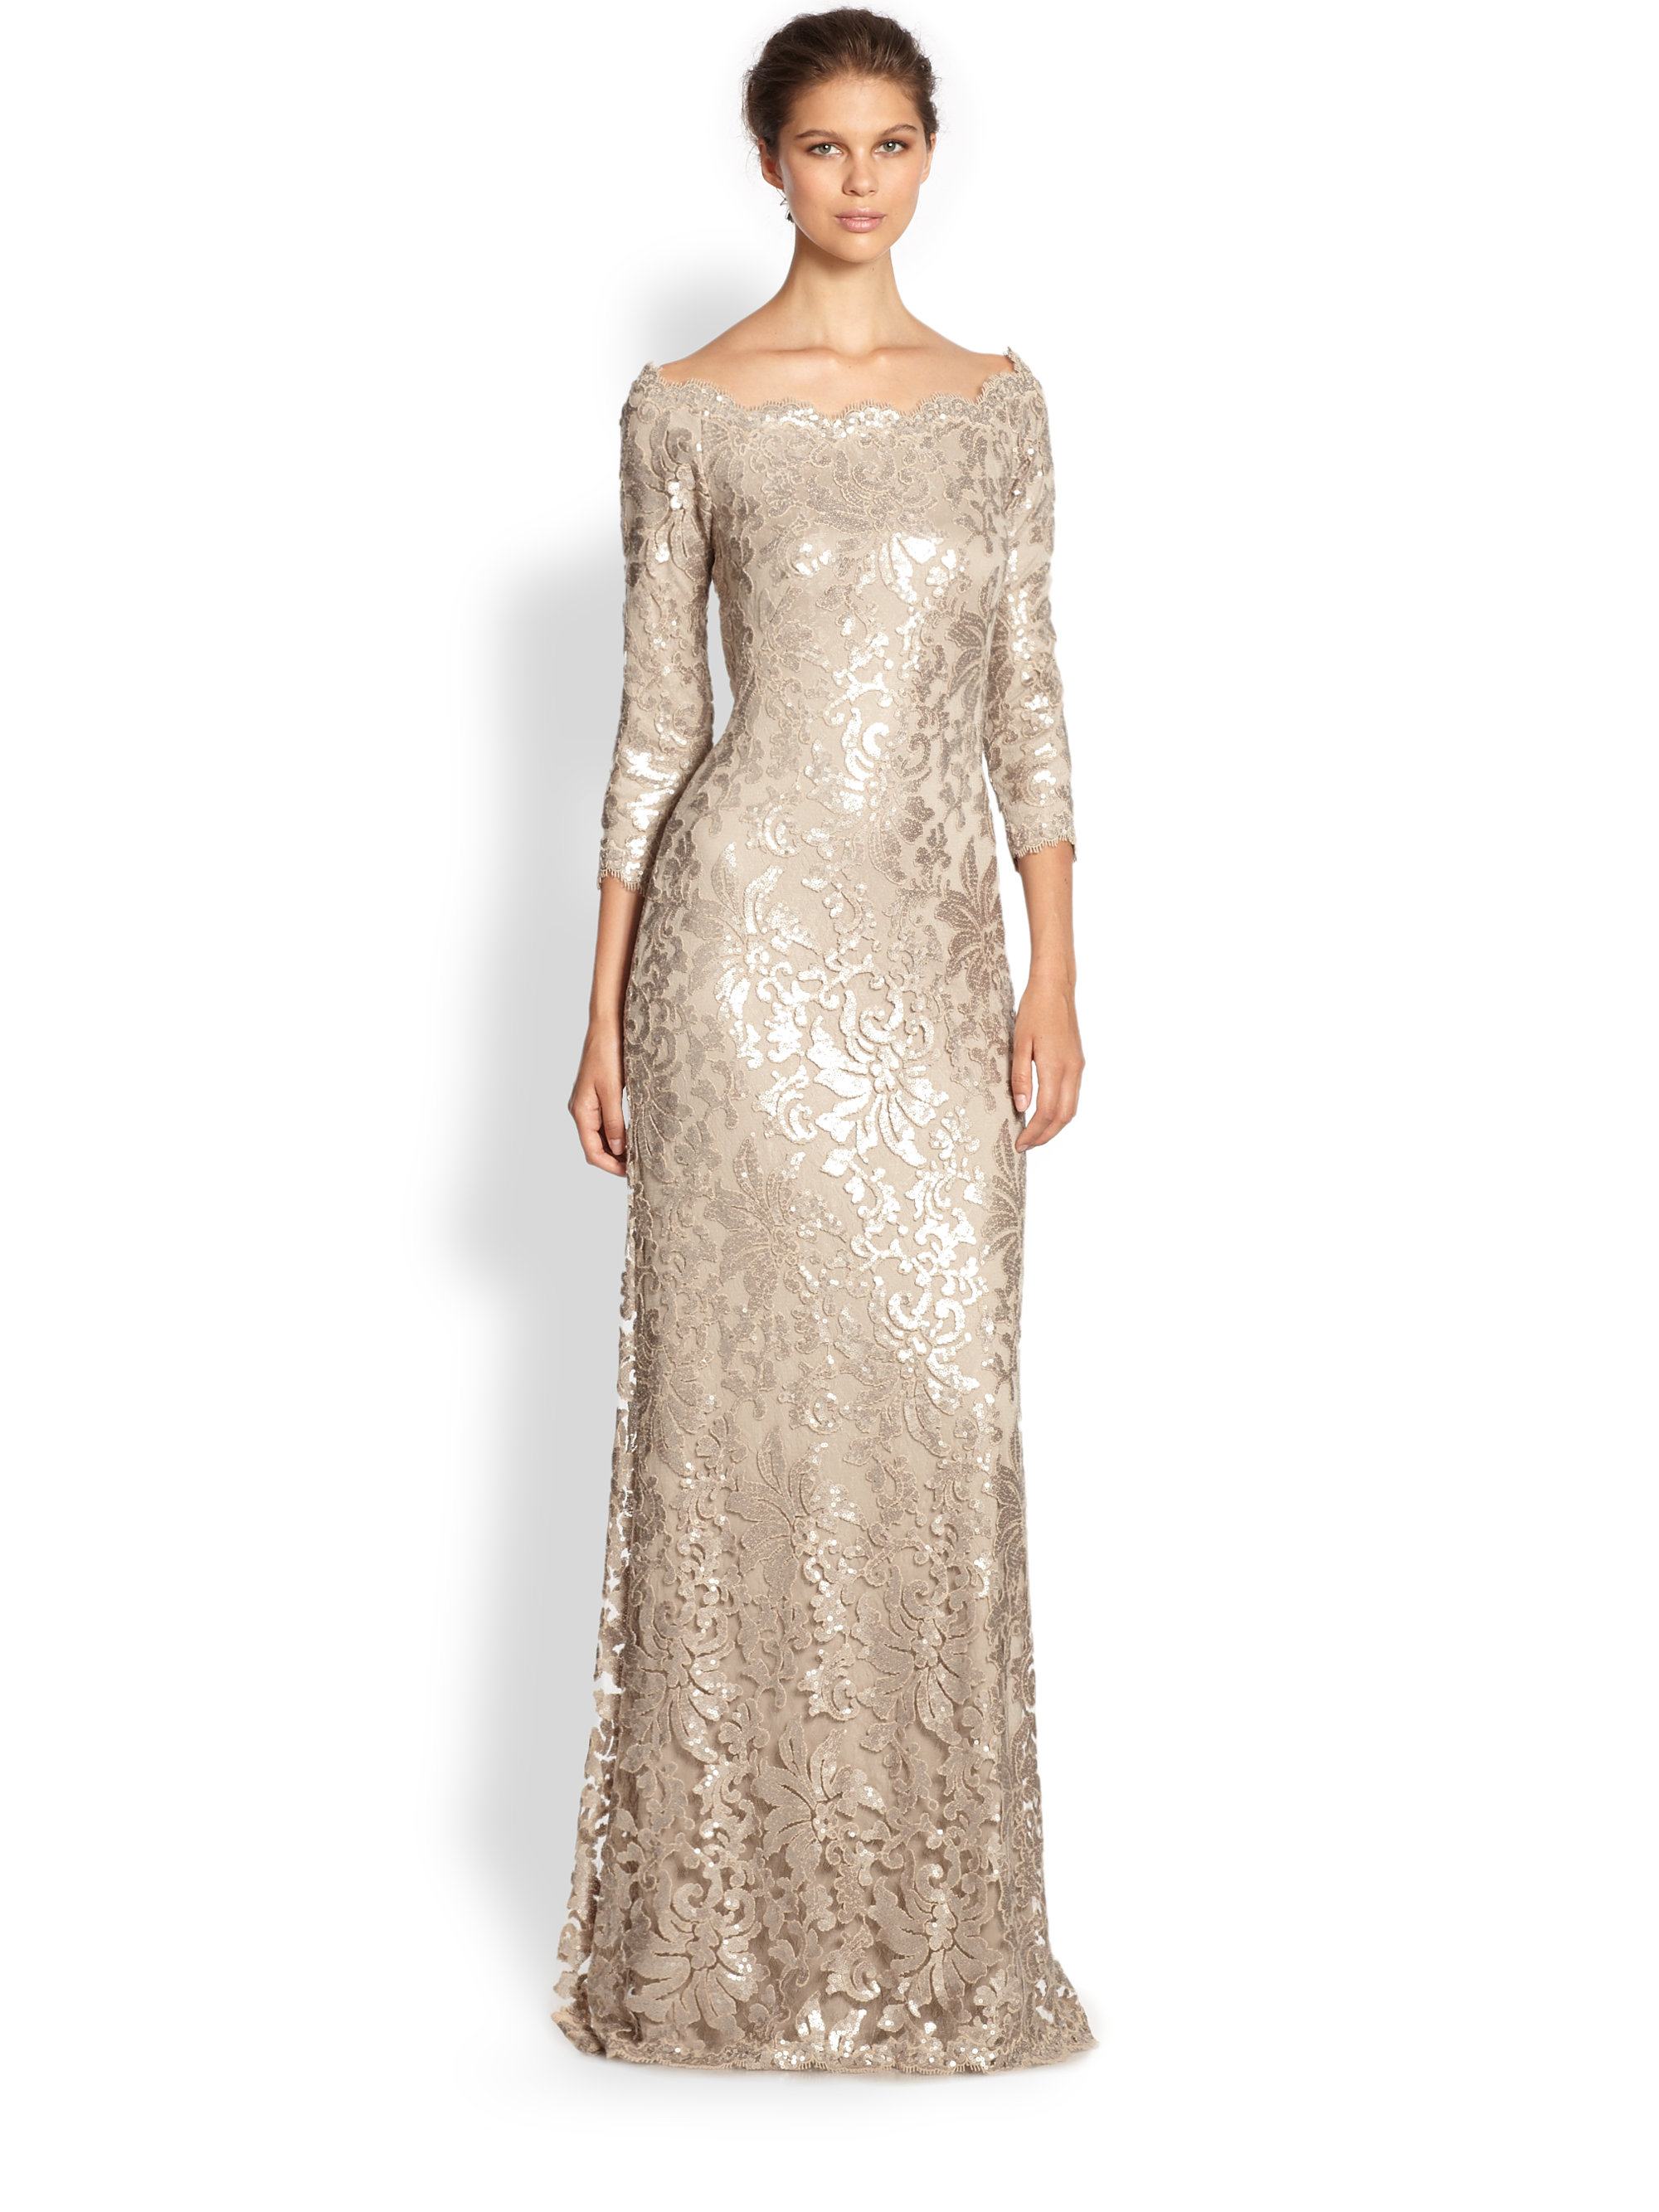 d32d42fe3d4 Mother Of The Bride Evening Dresses Saks